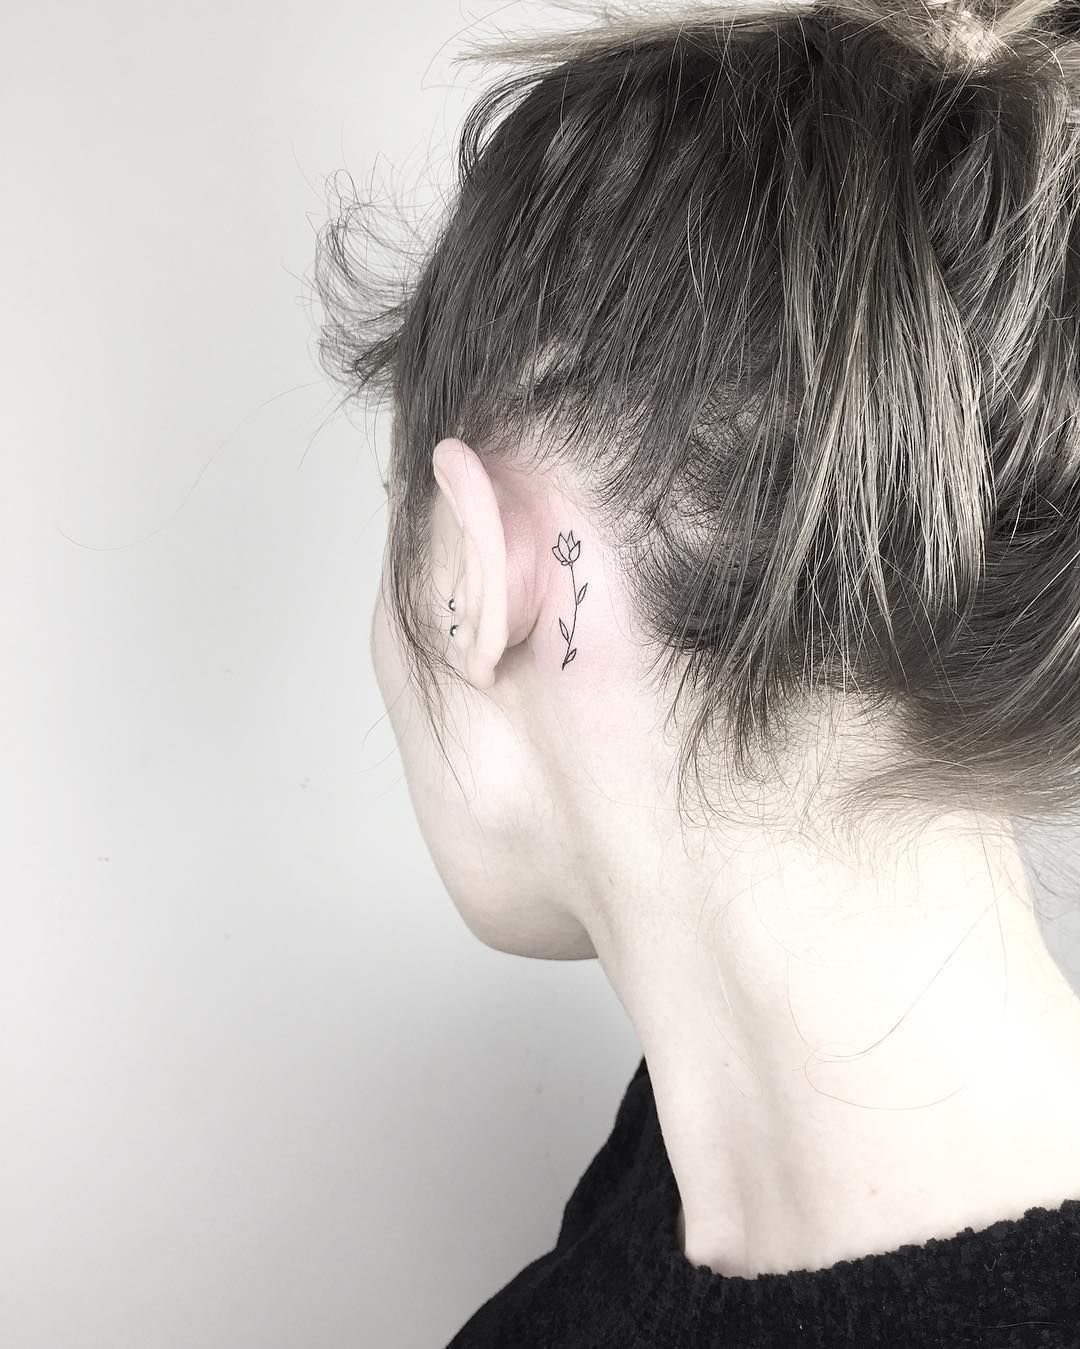 behind the ear flower tattoo | — tattoos on women — | pinterest